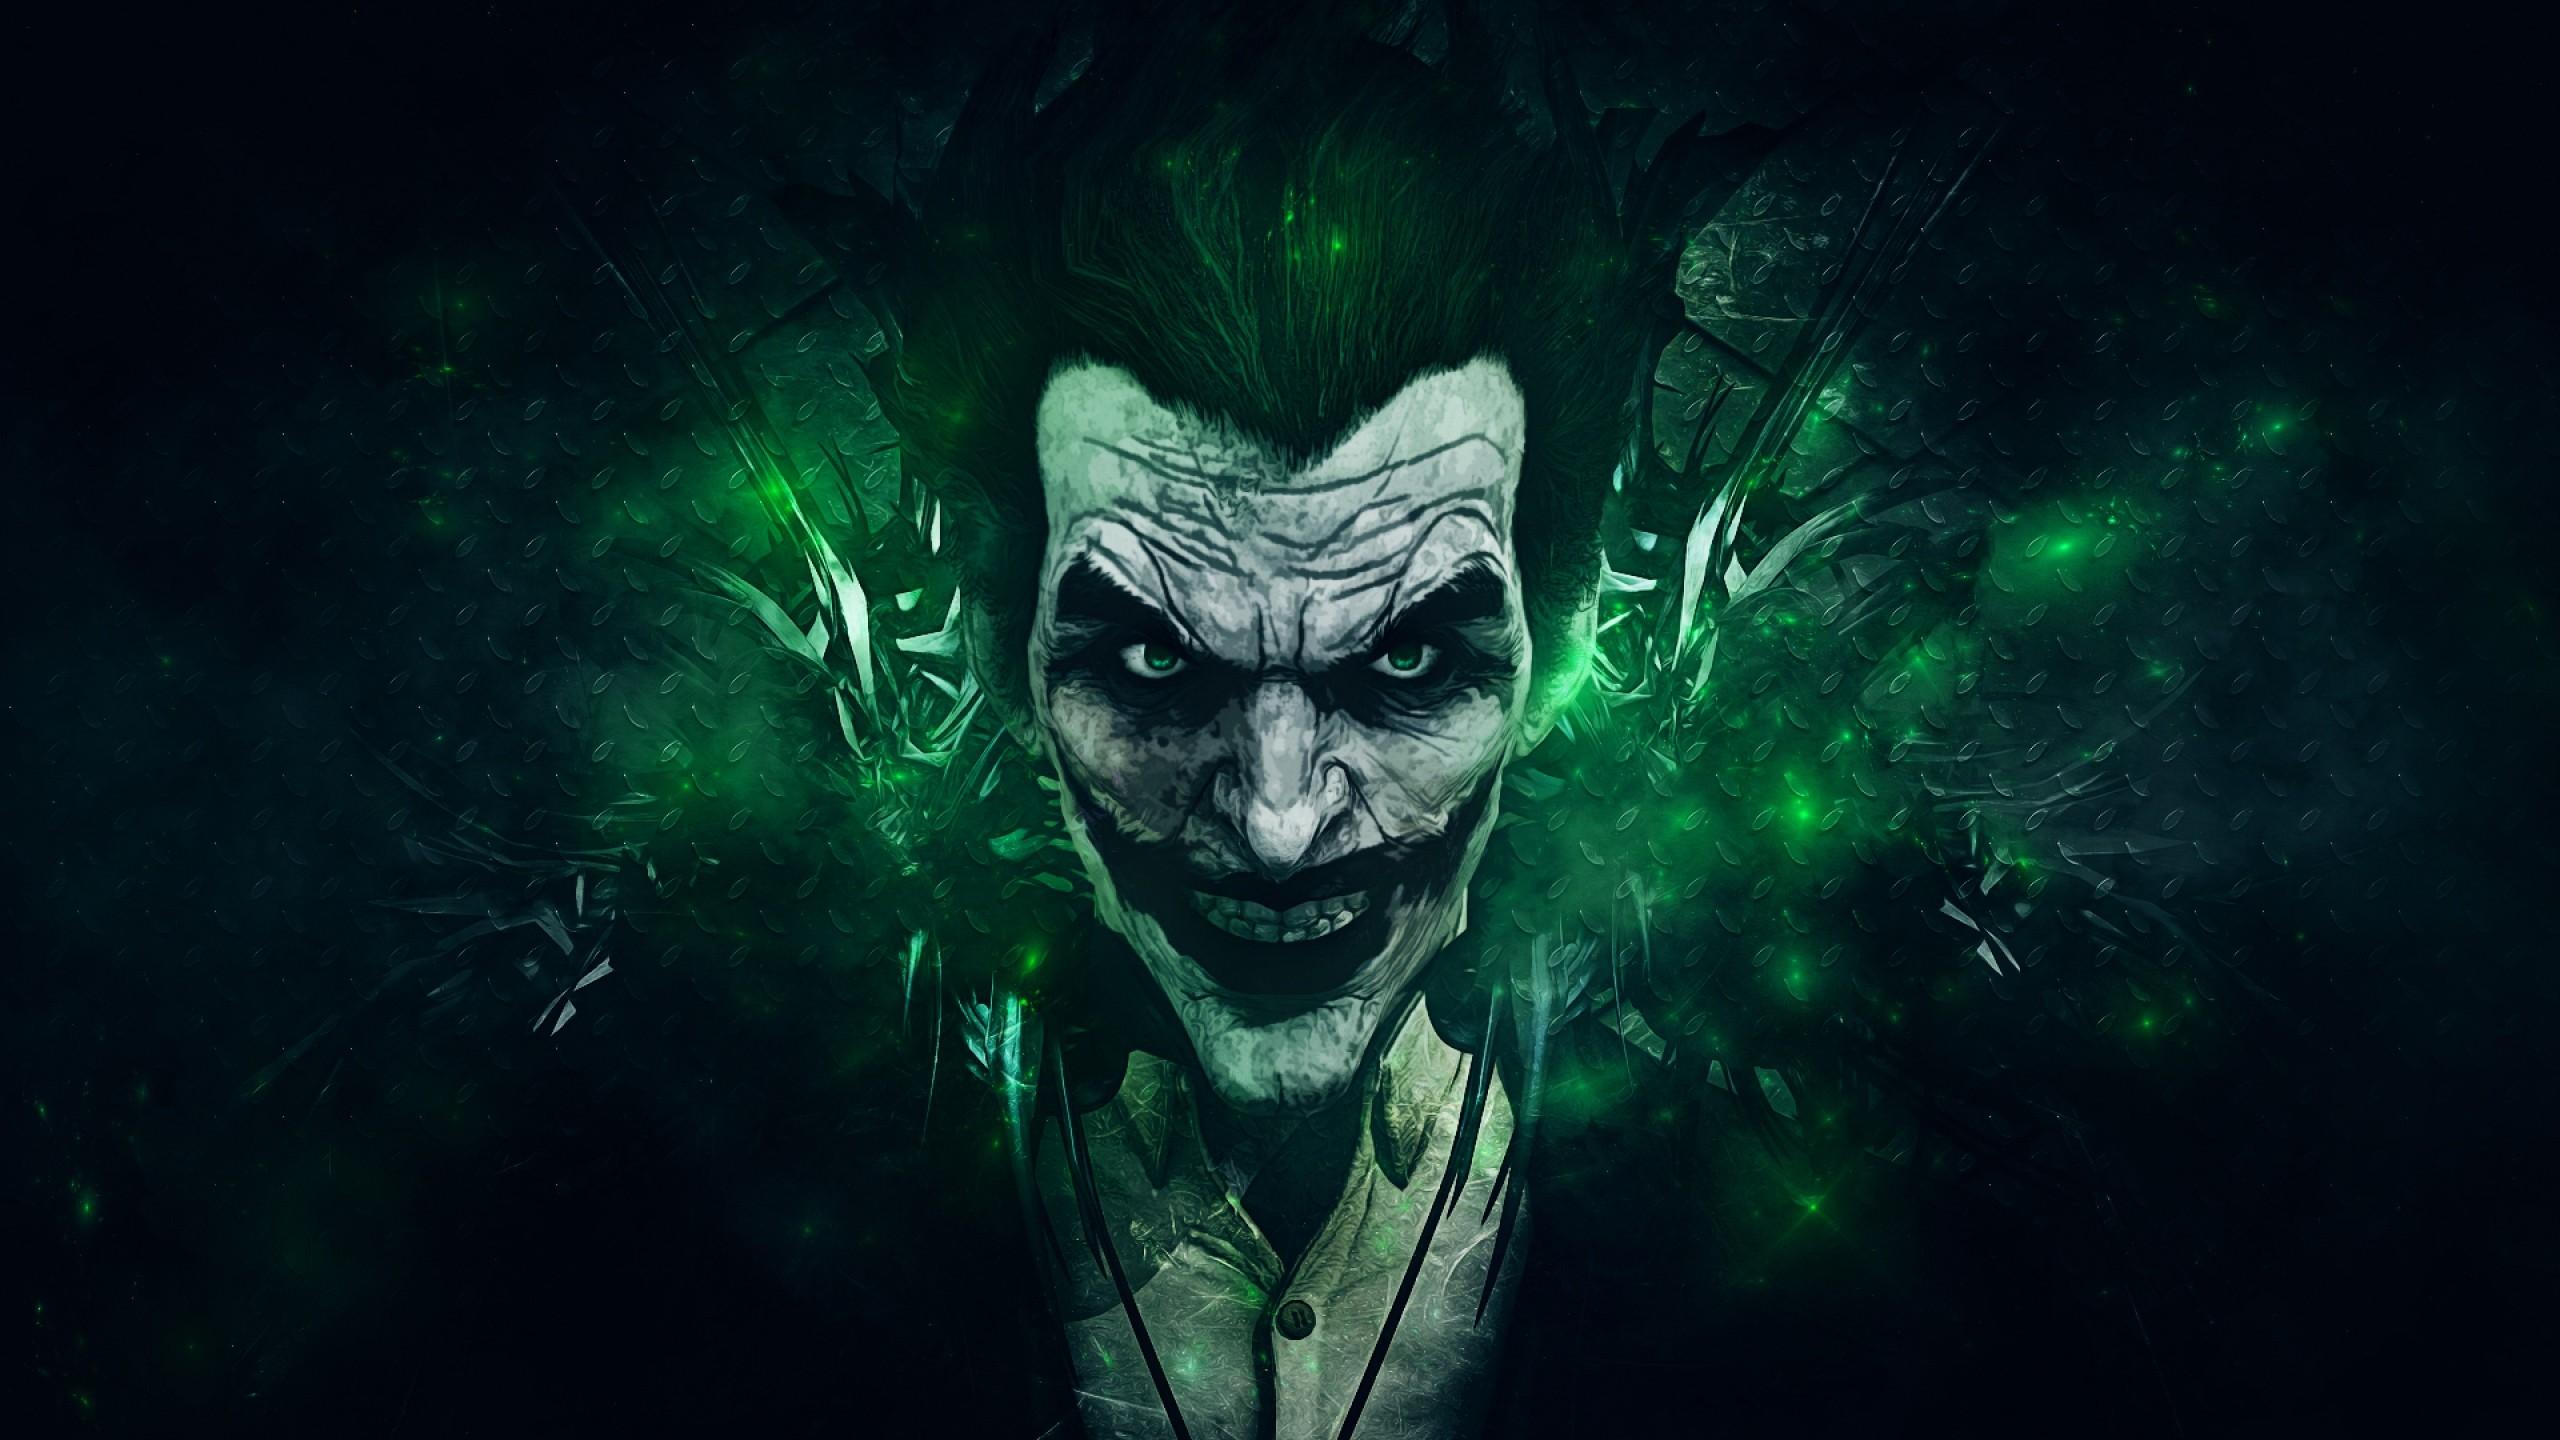 Wallpaper batman arkham origins, joker, games montreal,  rocksteady studios